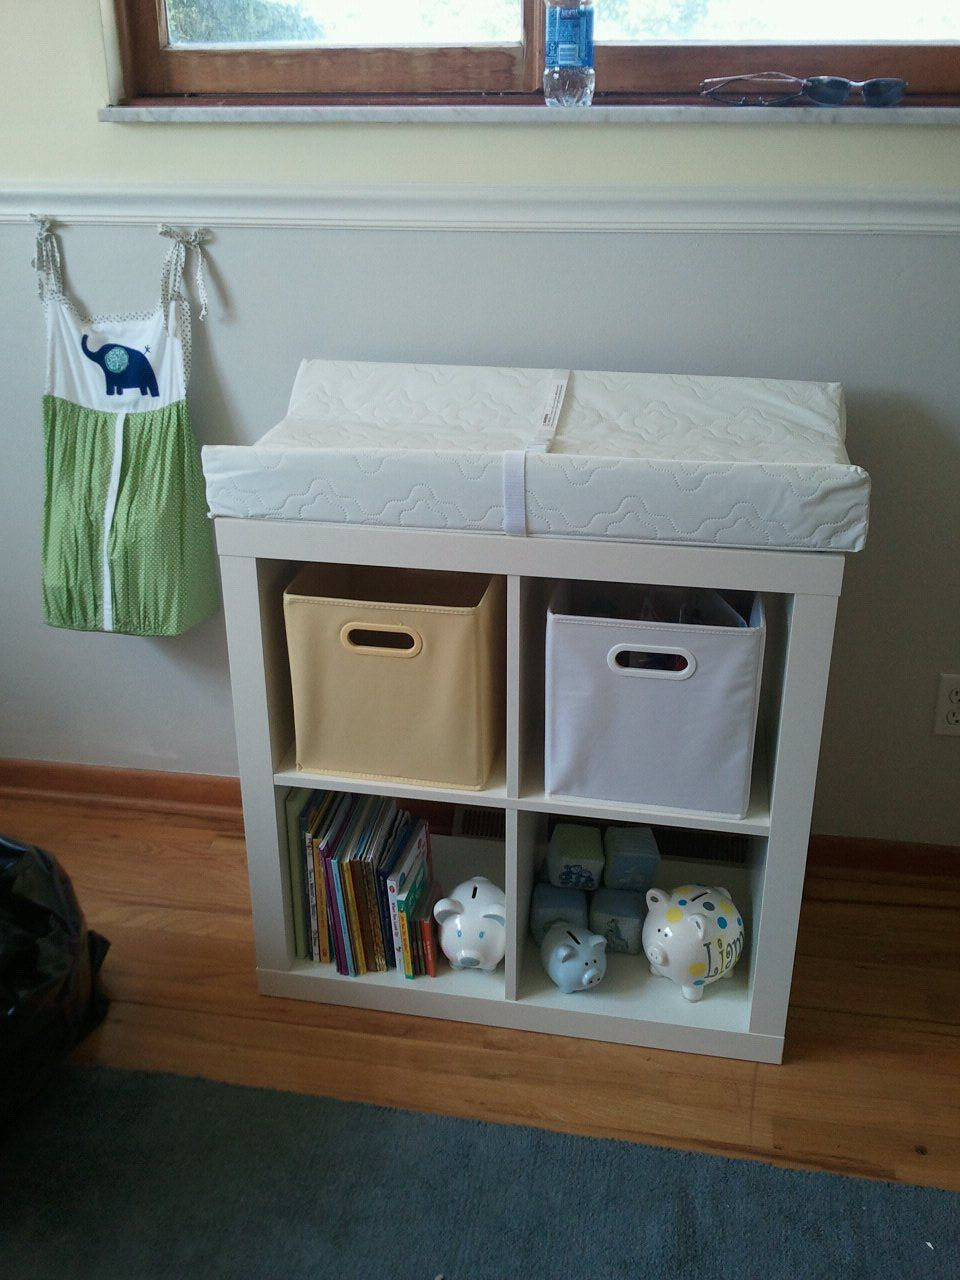 ikea shelf changing table | preschool: environment | pinterest